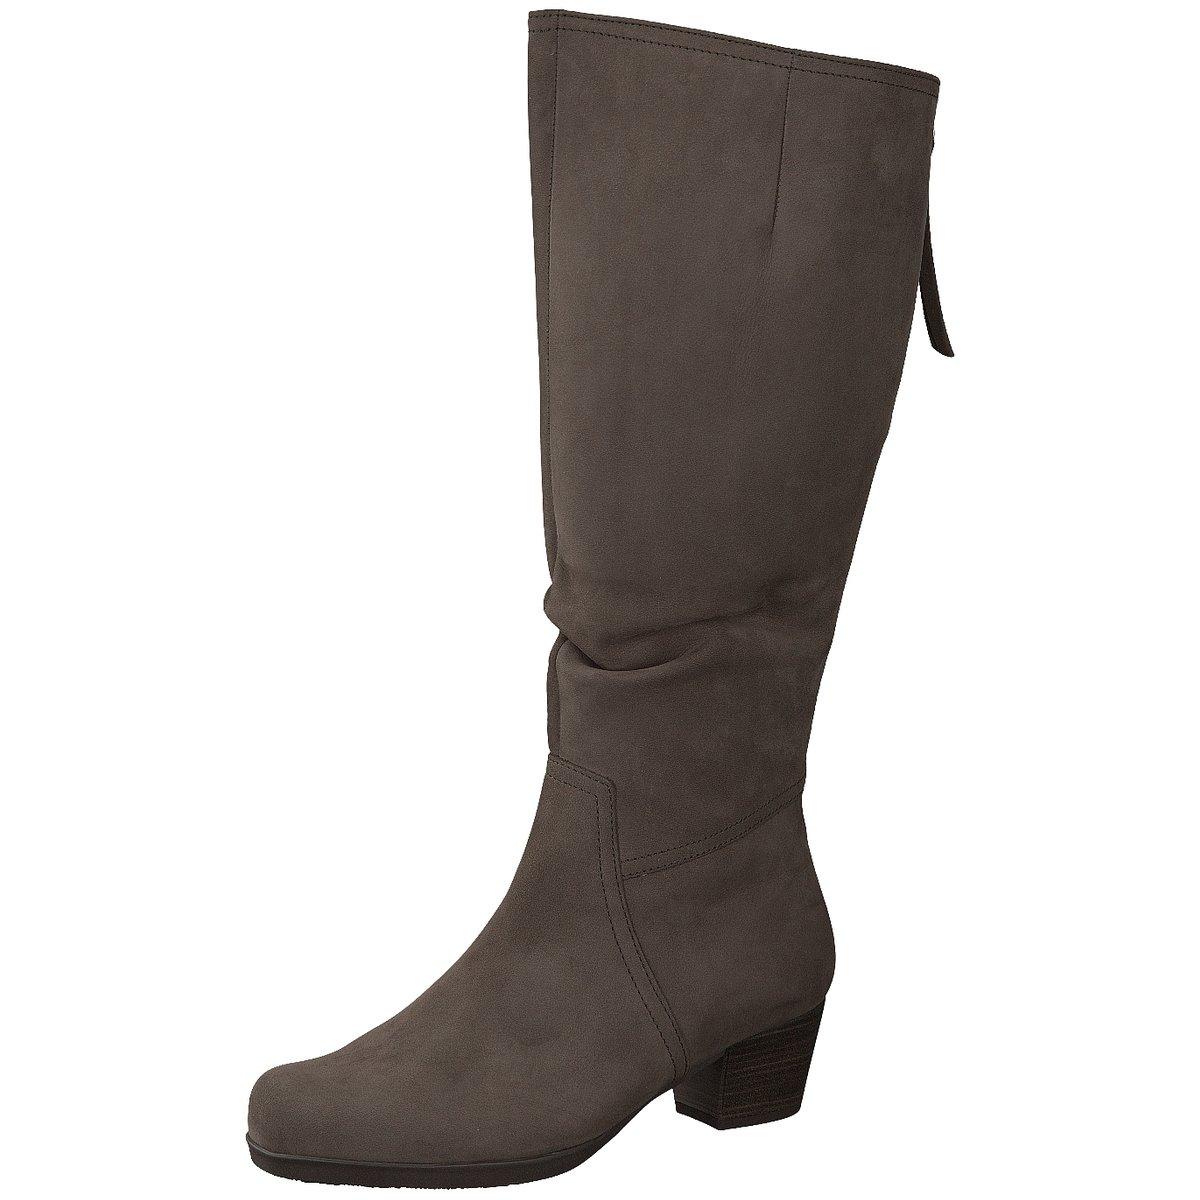 Gabor Comfort Damen Stiefel ungefüttert | GABOR COMFORT